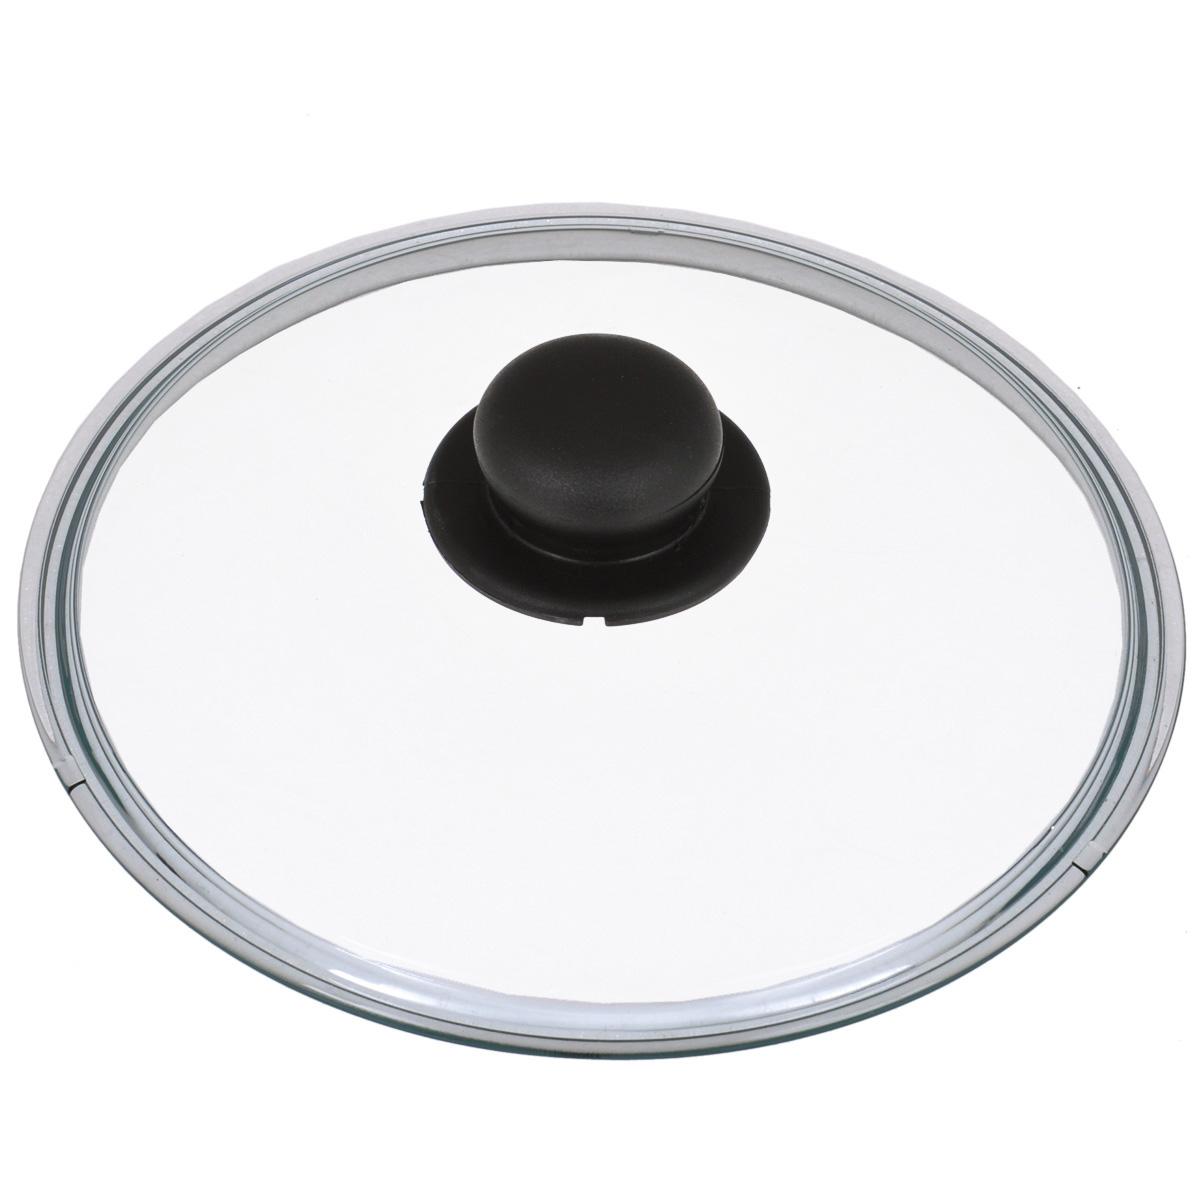 Крышка стеклянная Tescoma Unicover. Диаметр 24 см619024